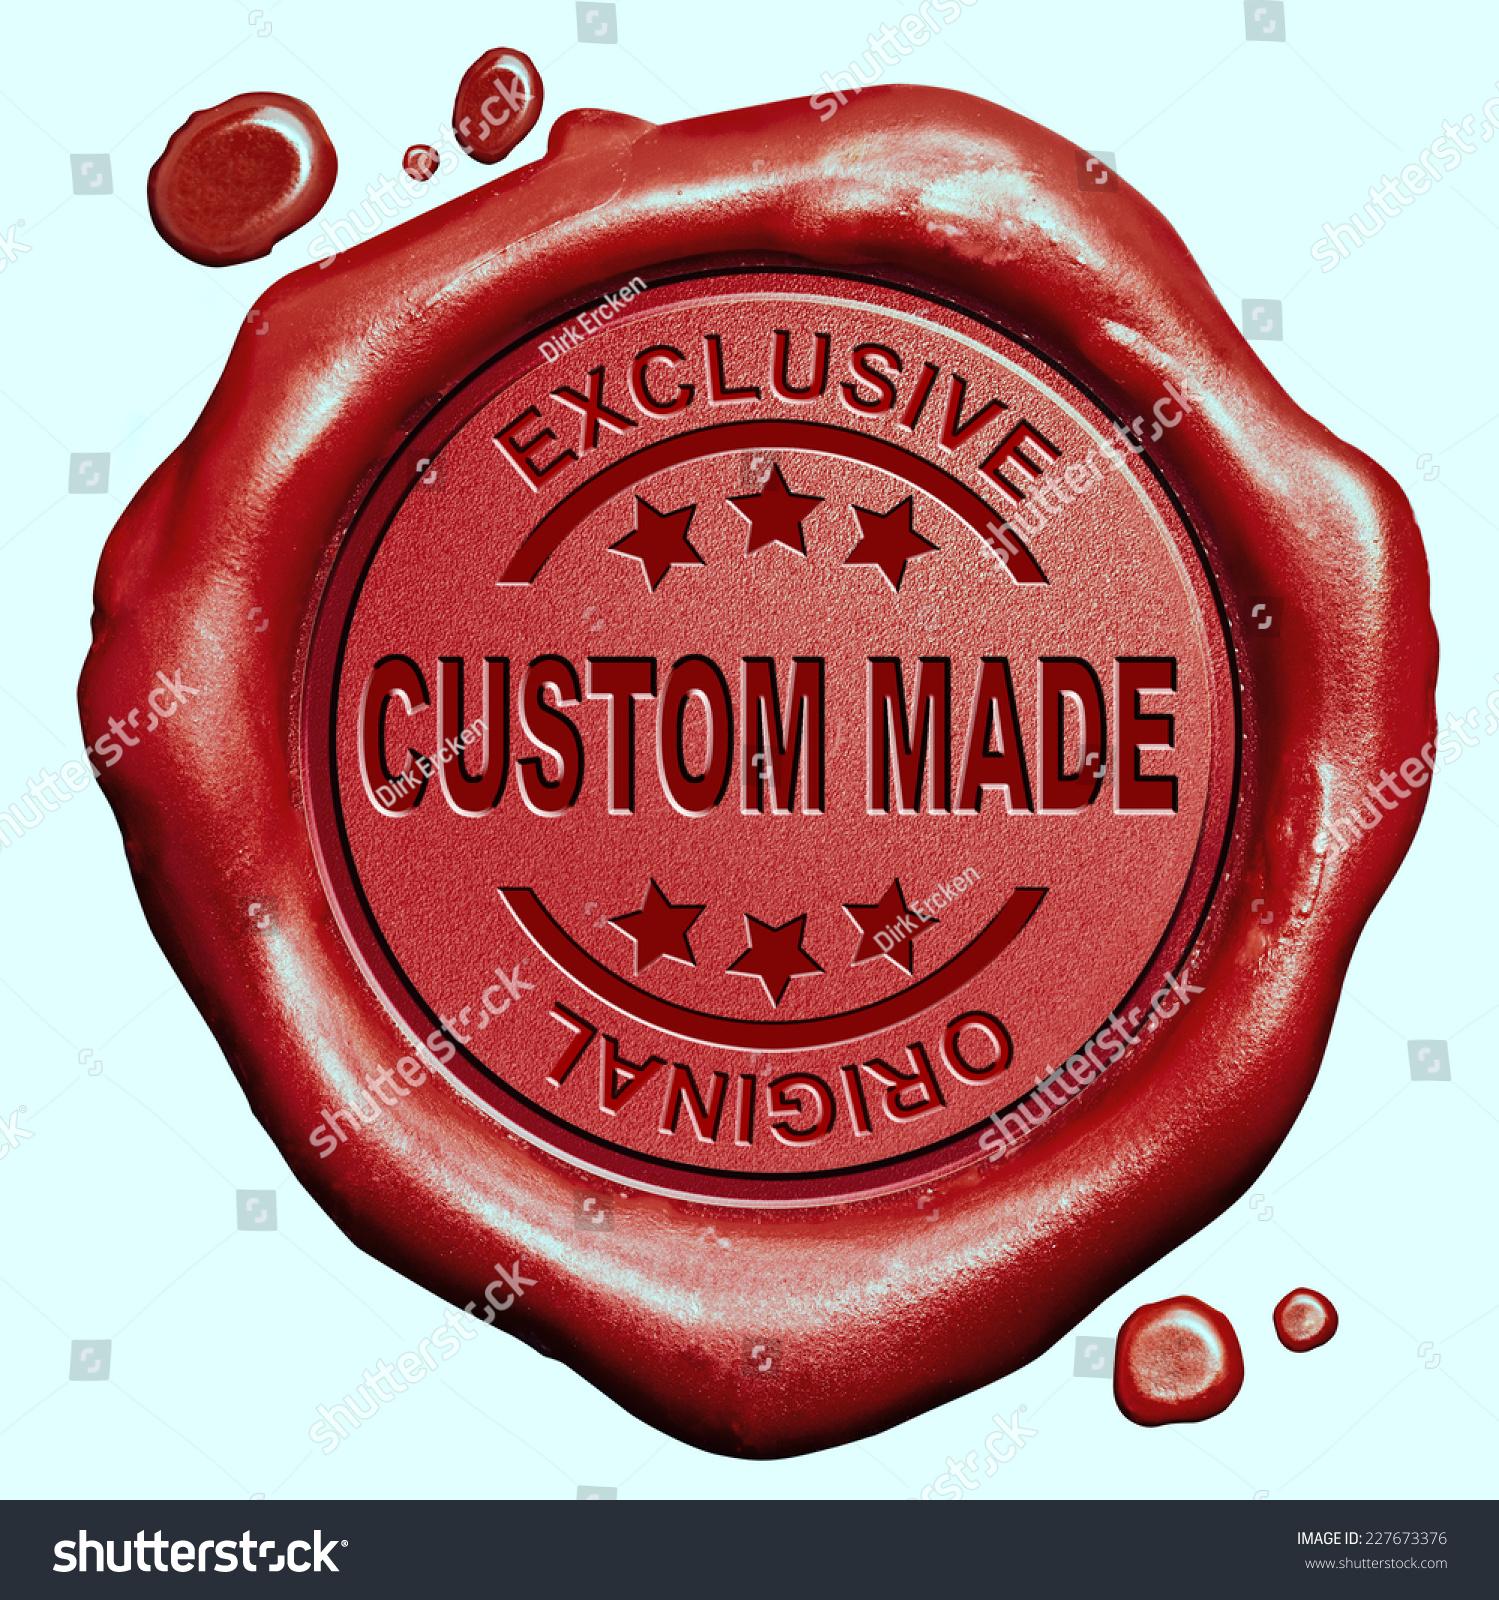 Custom made customized handcraft hand crafted authentic for Handcrafted or hand crafted